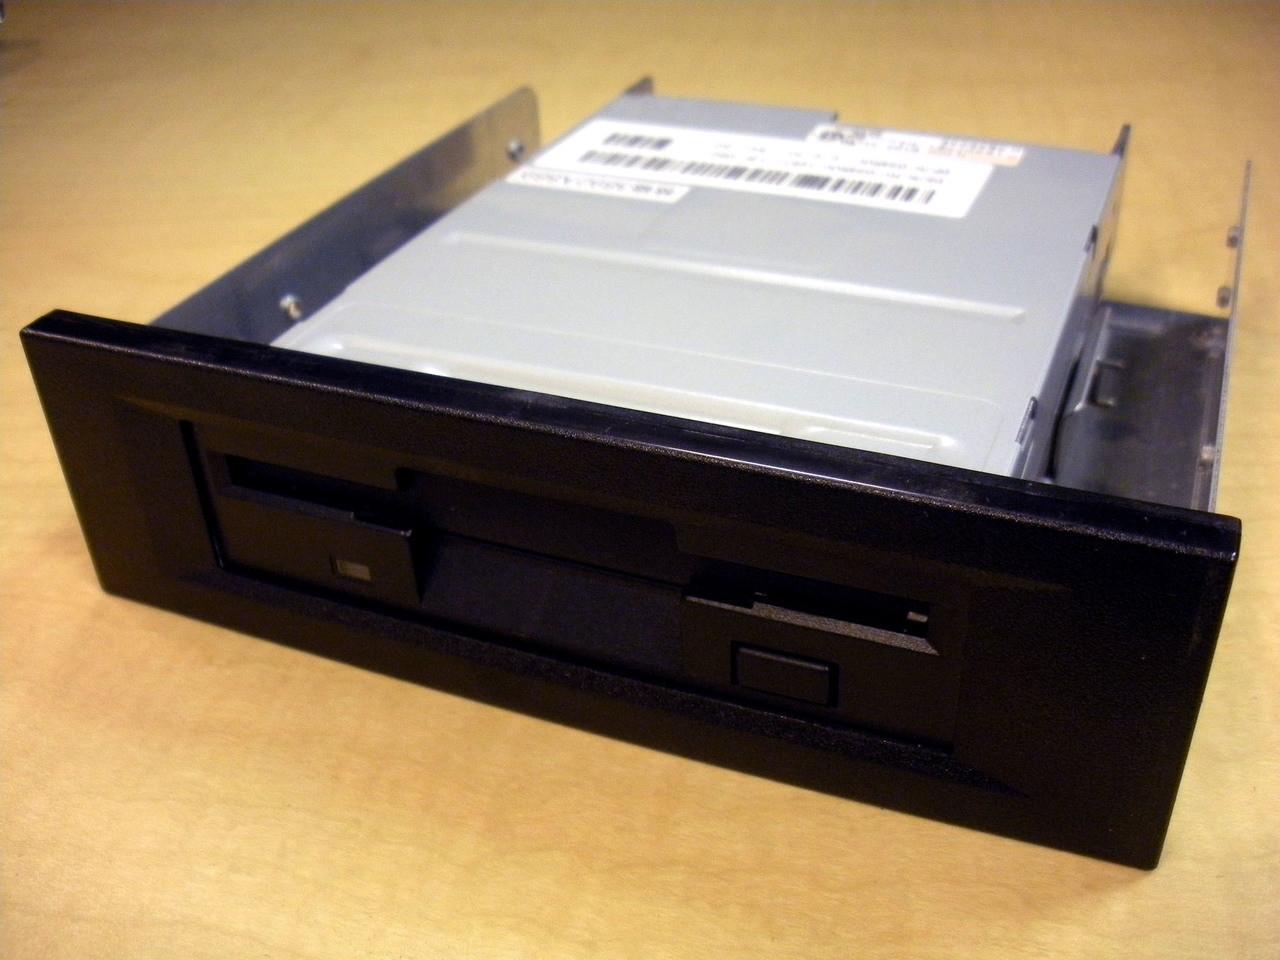 Dell Floppy Drives